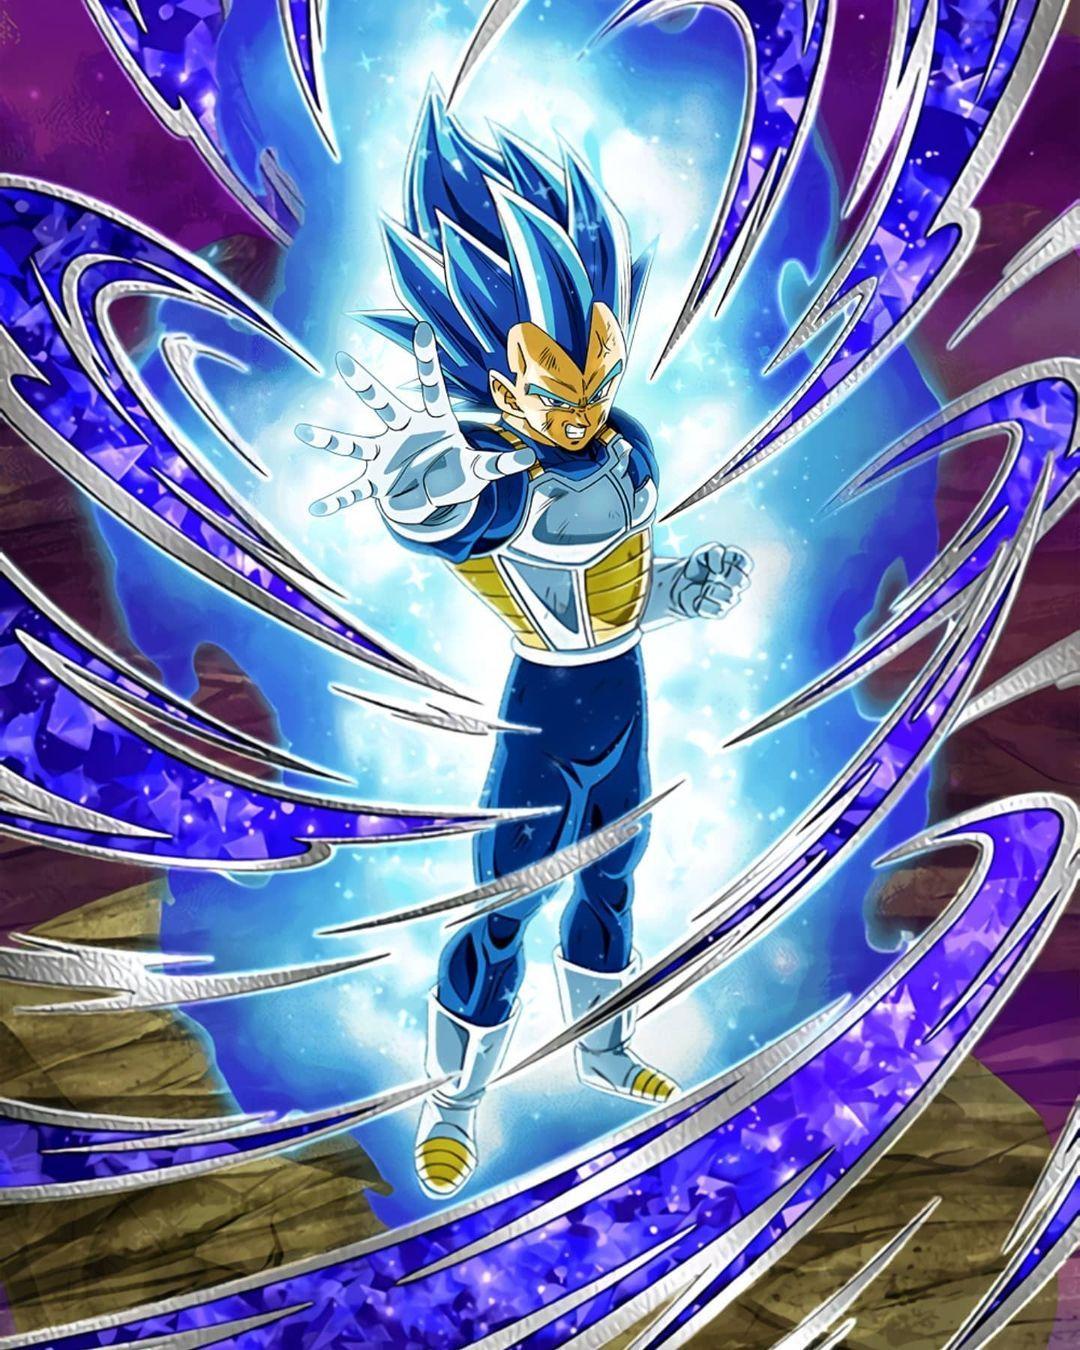 2 169 Curtidas 5 Comentarios Dokkan Battle Dokkan Battlenews No Instagram Ssr To Lr Hd Art In 2021 Anime Dragon Ball Super Dragon Ball Painting Dragon Ball Art